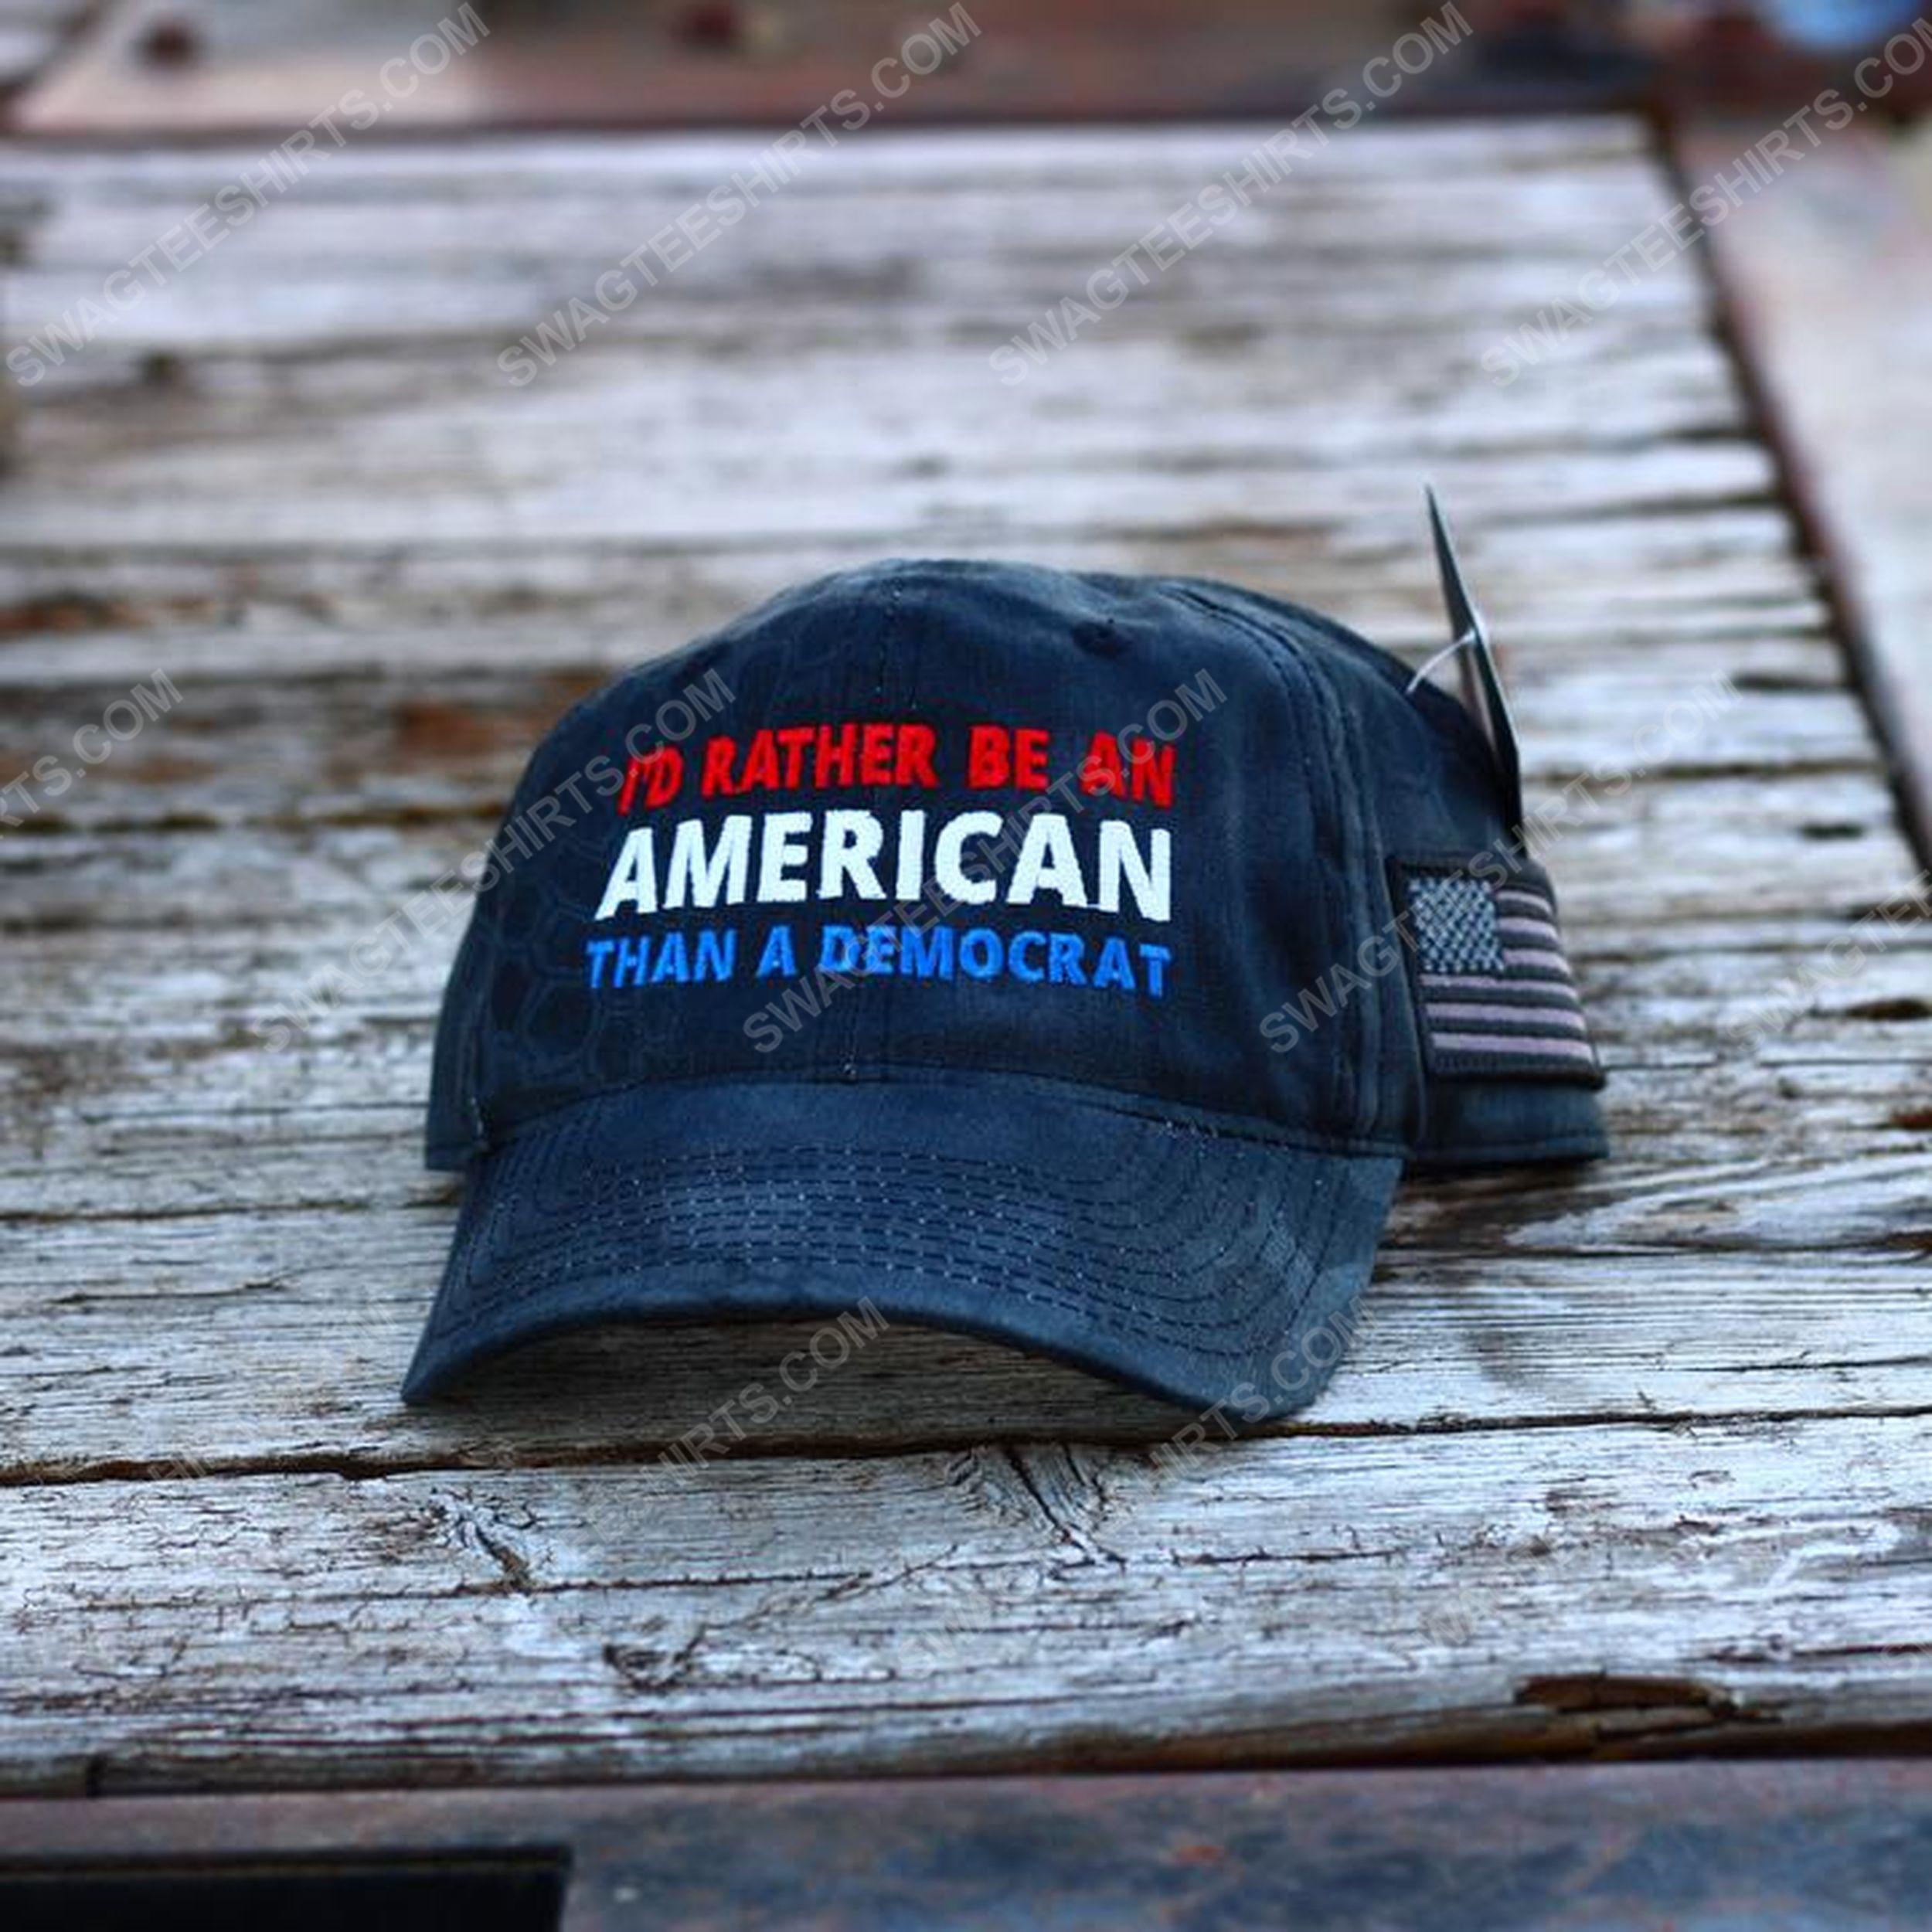 I'd rather be an american than a democrat full print classic hat 1